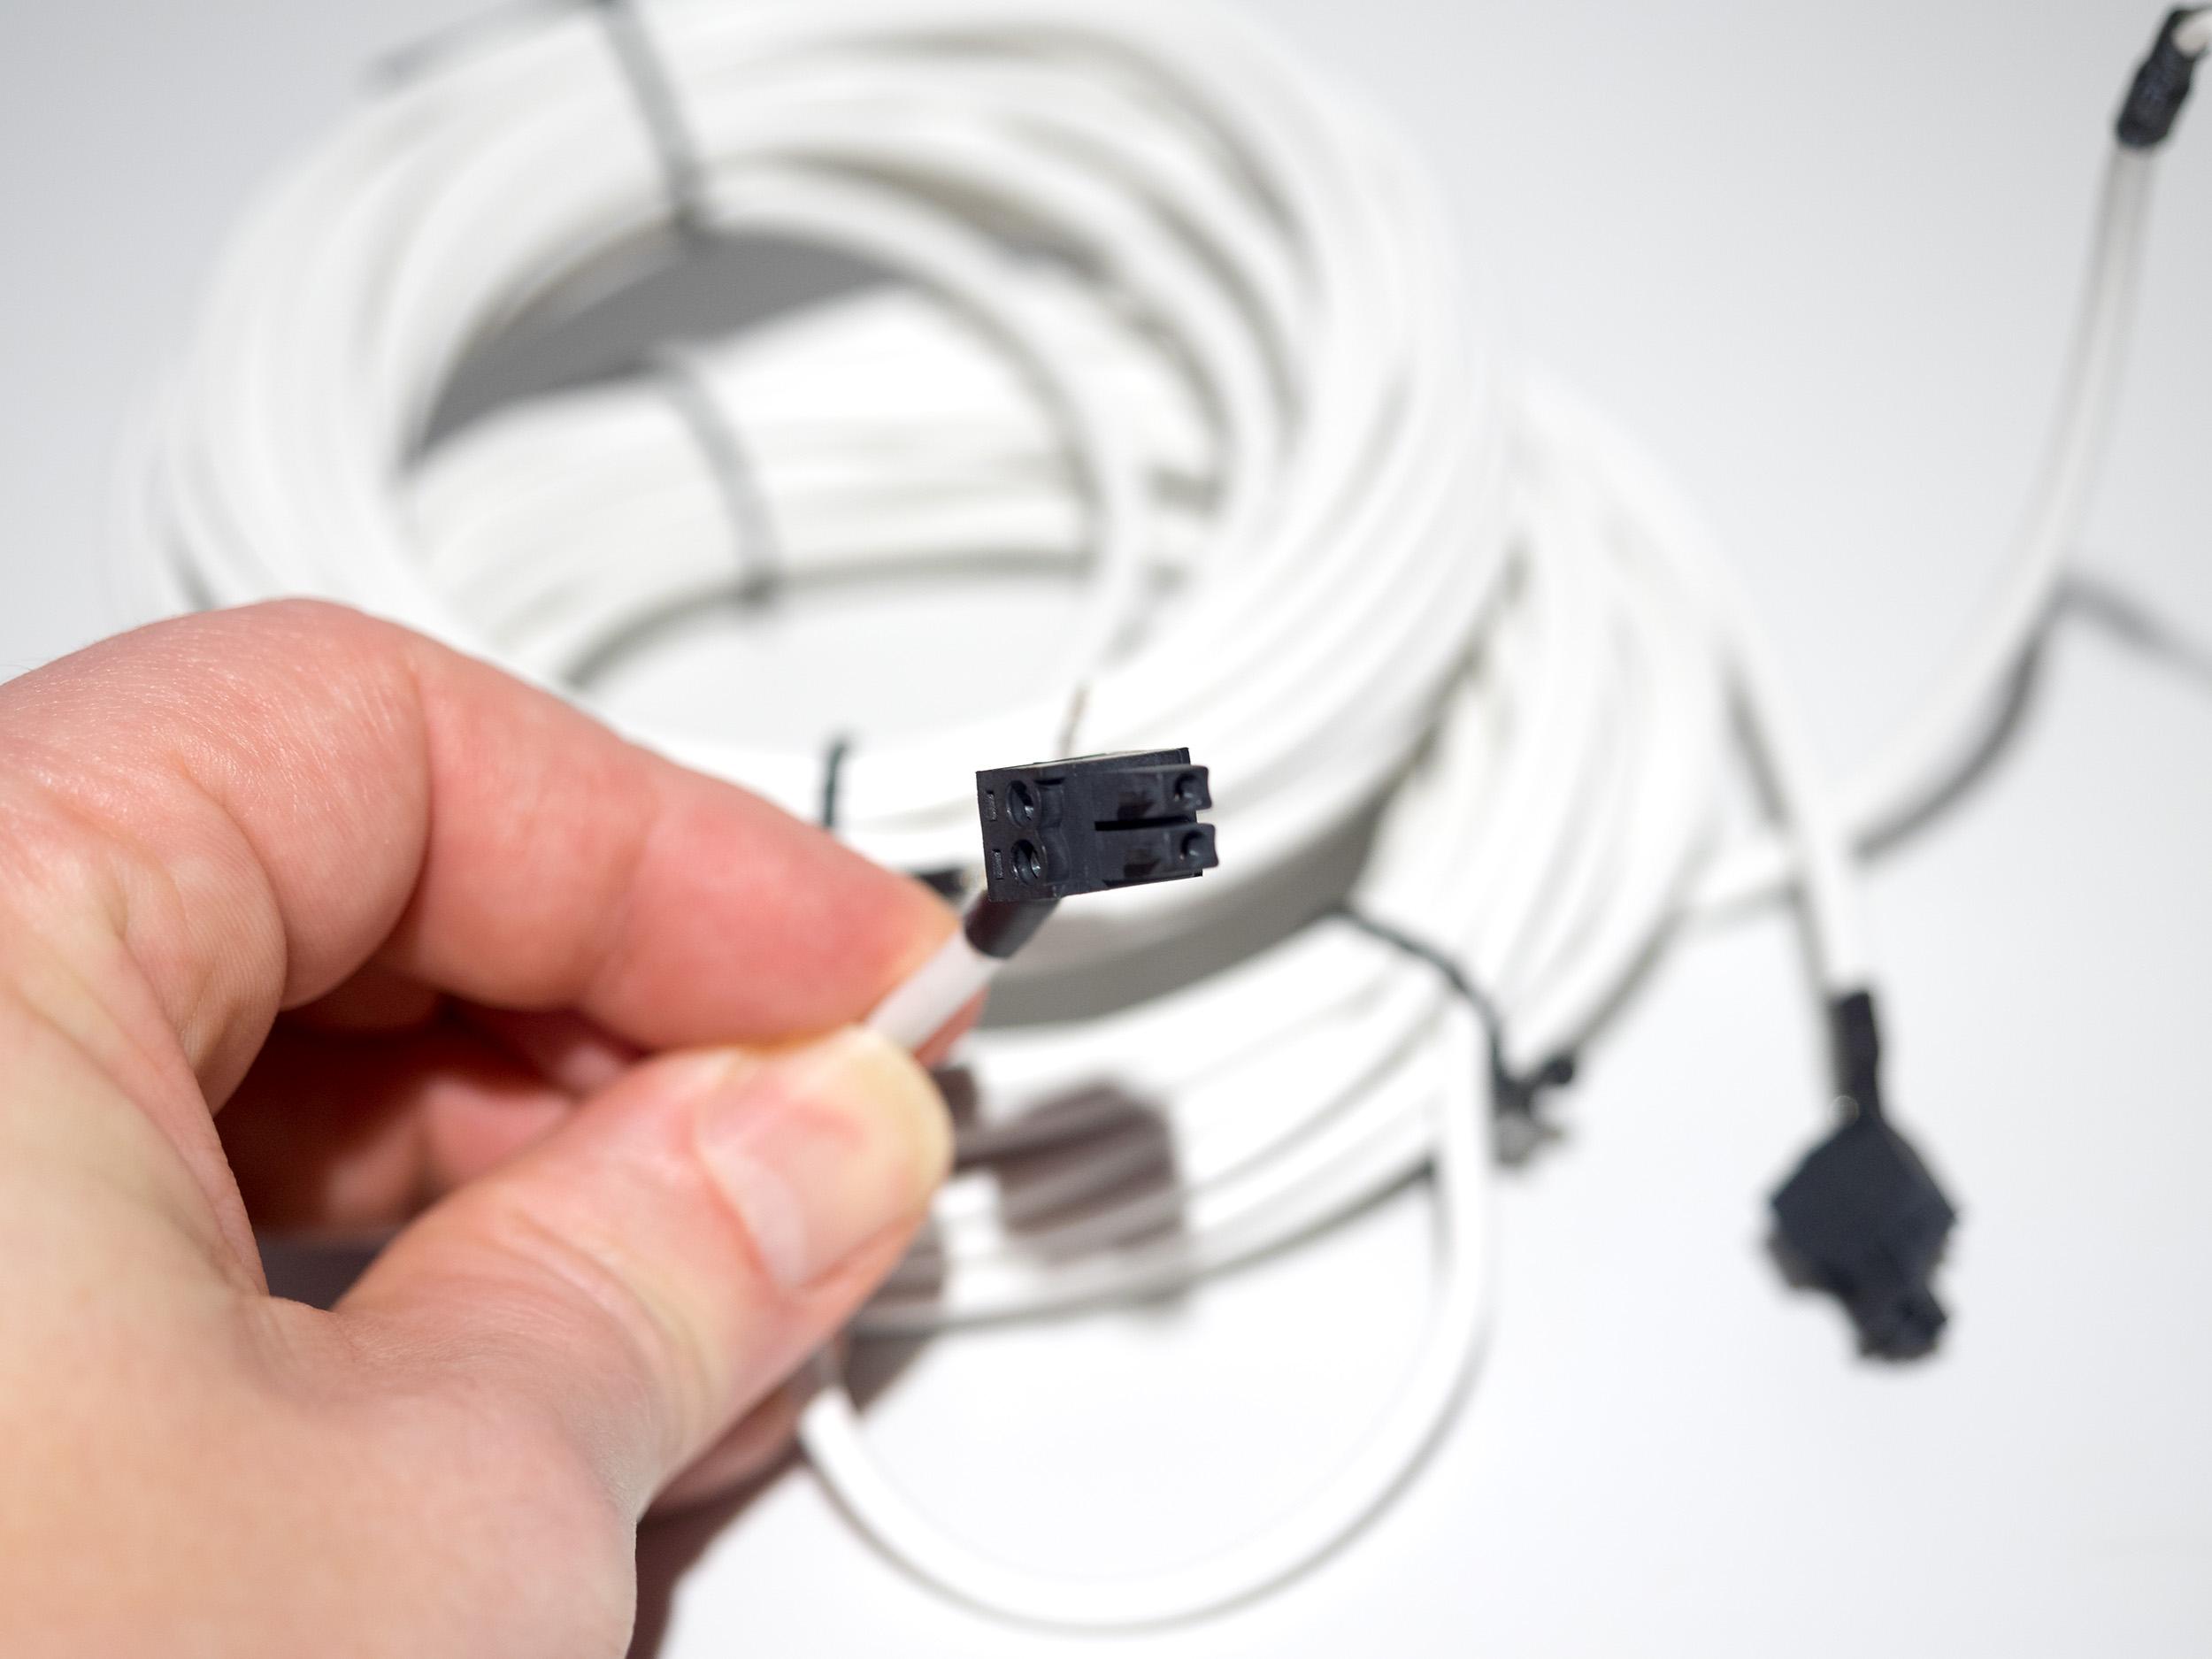 Praxistest: B&O BeoPlay S8 – 2.1 Lautsprechersystem | News ...